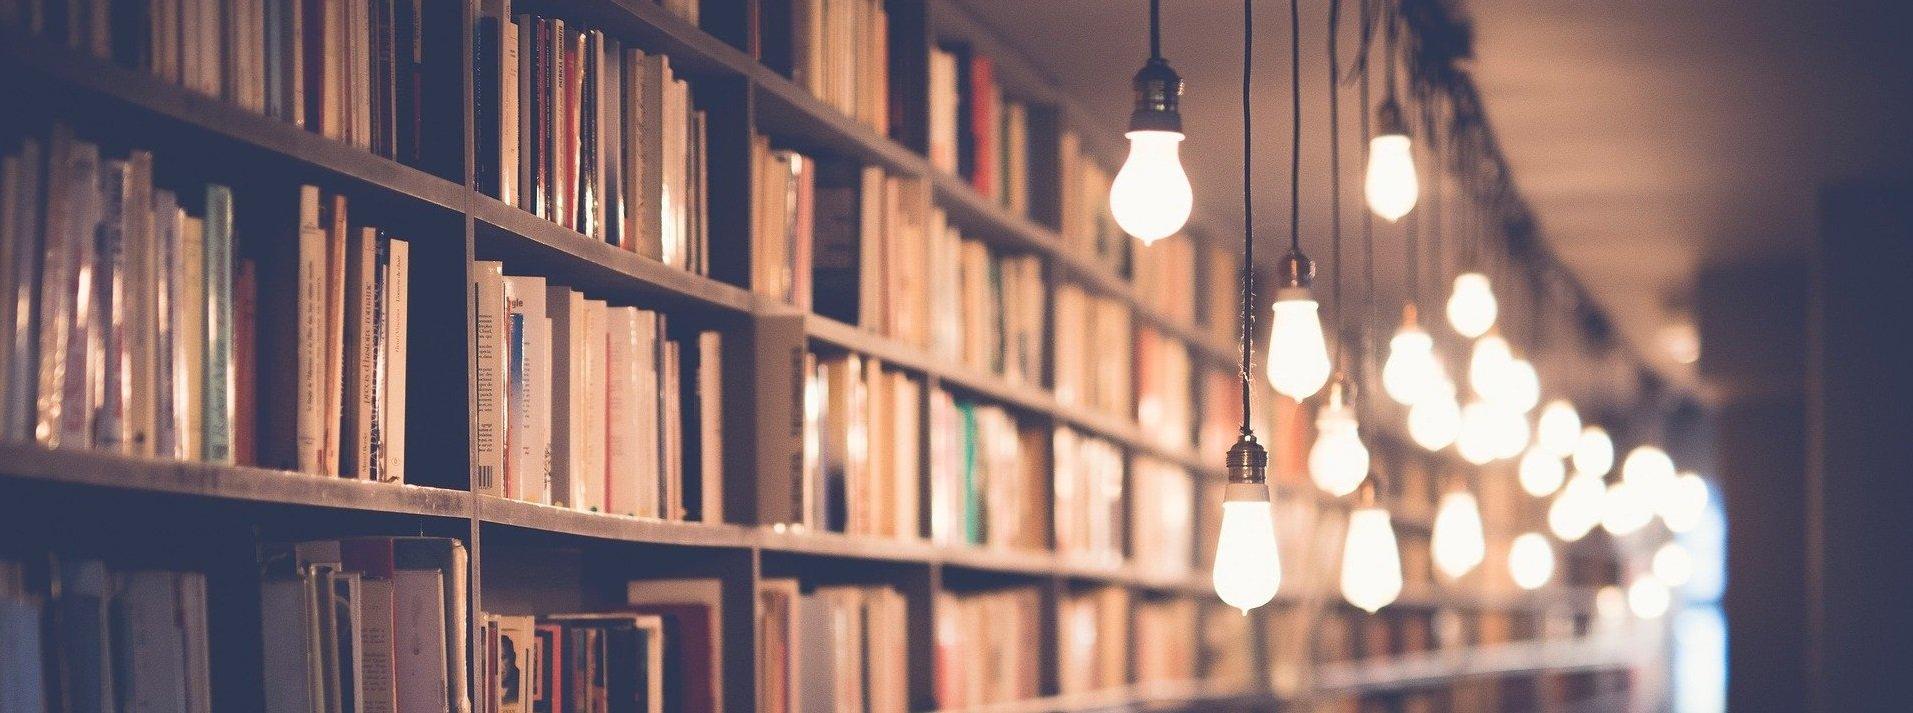 books-2596809_1920 – Kopi